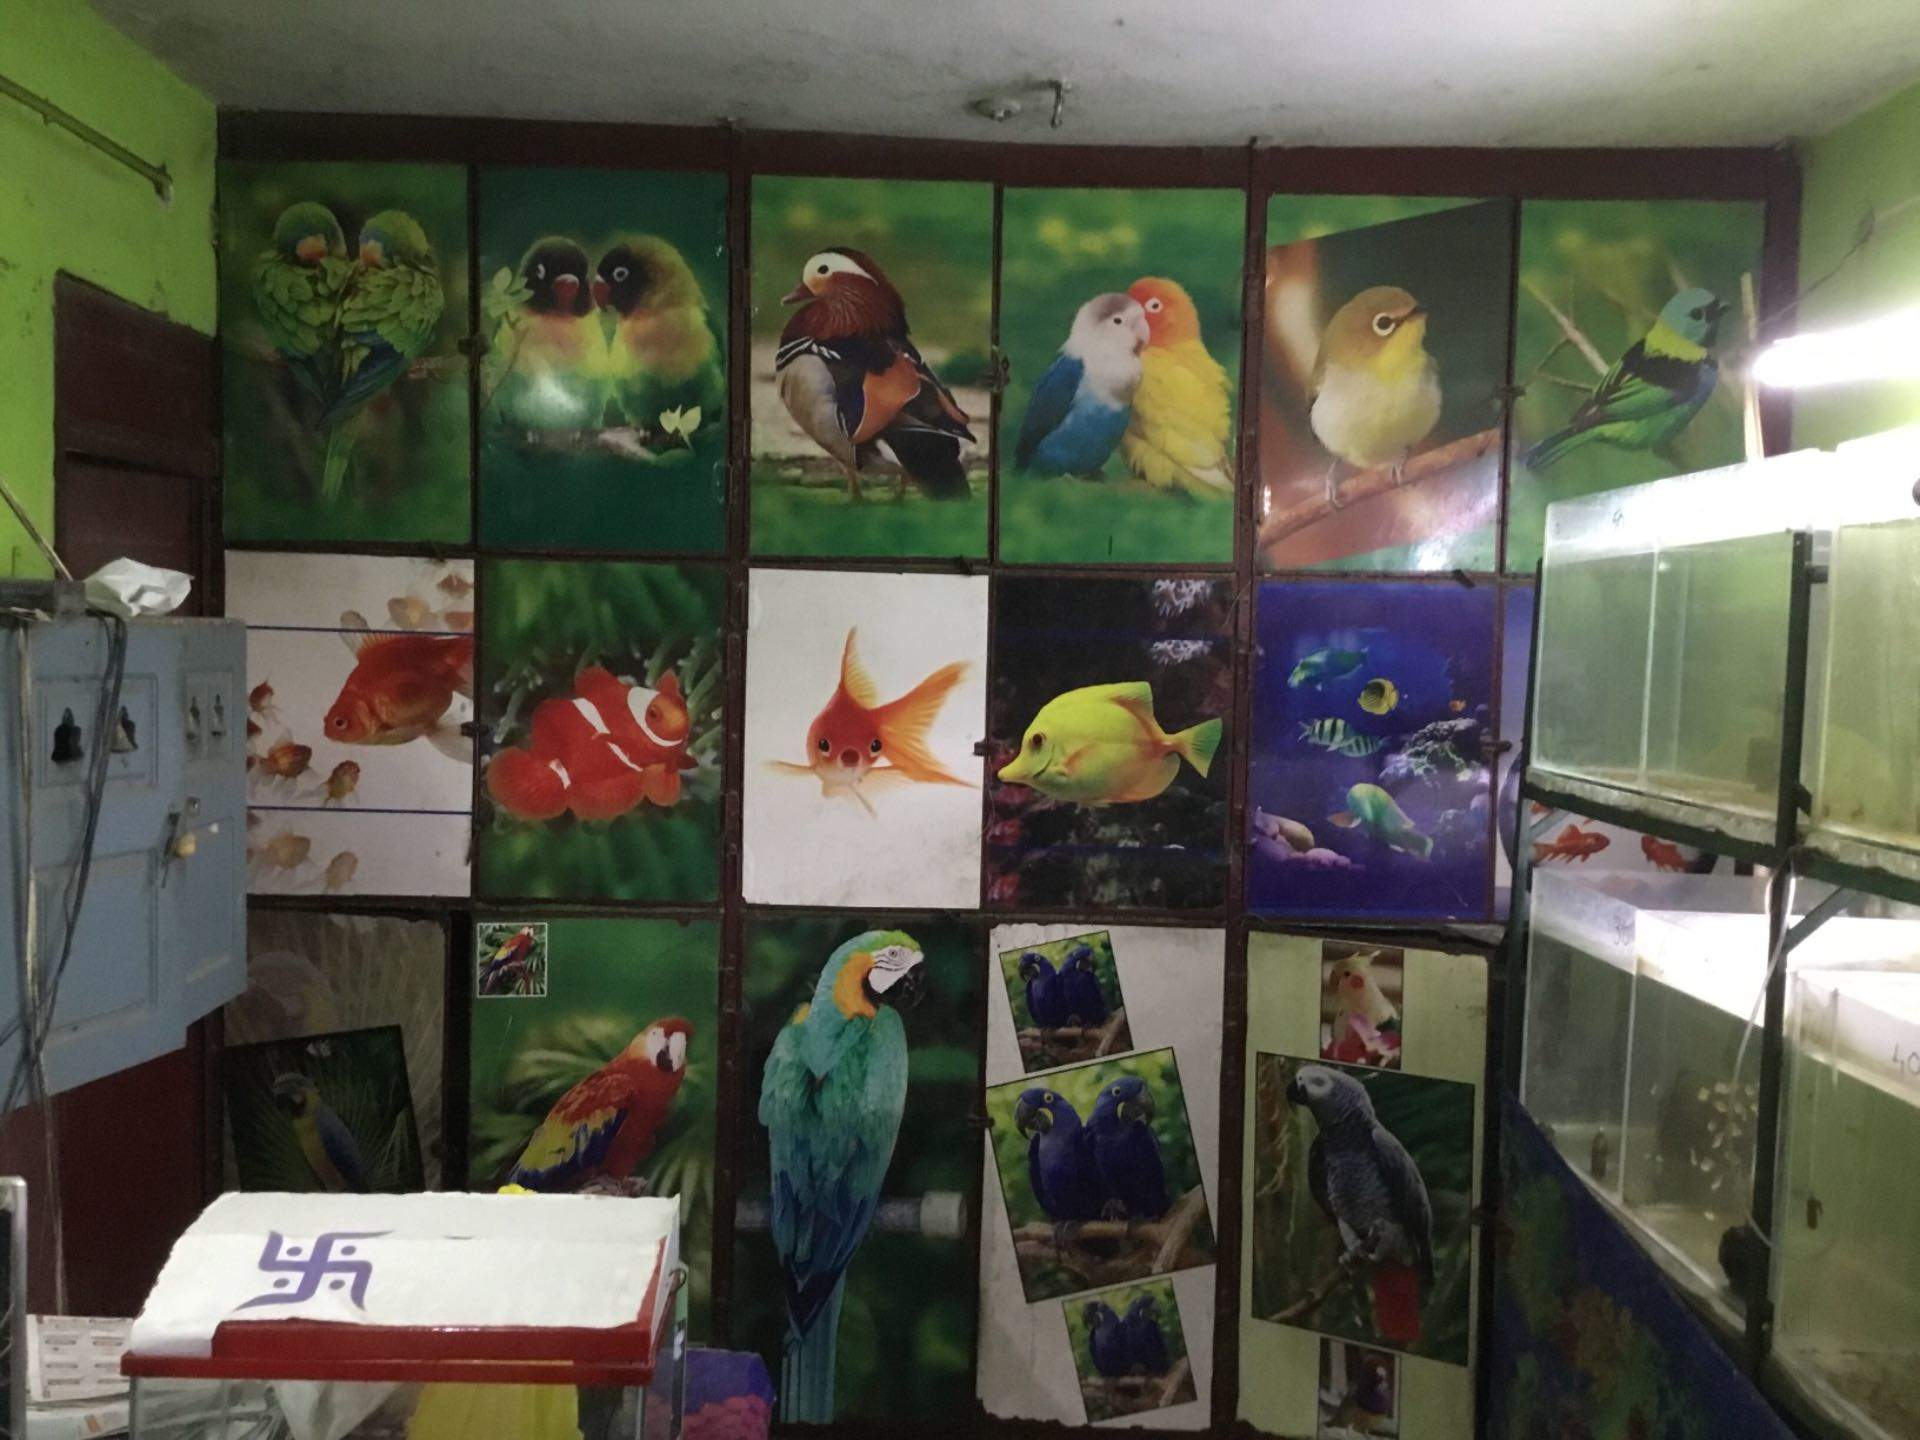 Top 10 Pet Shops For Birds in Vijayawada - Best Bird Shops - Justdial